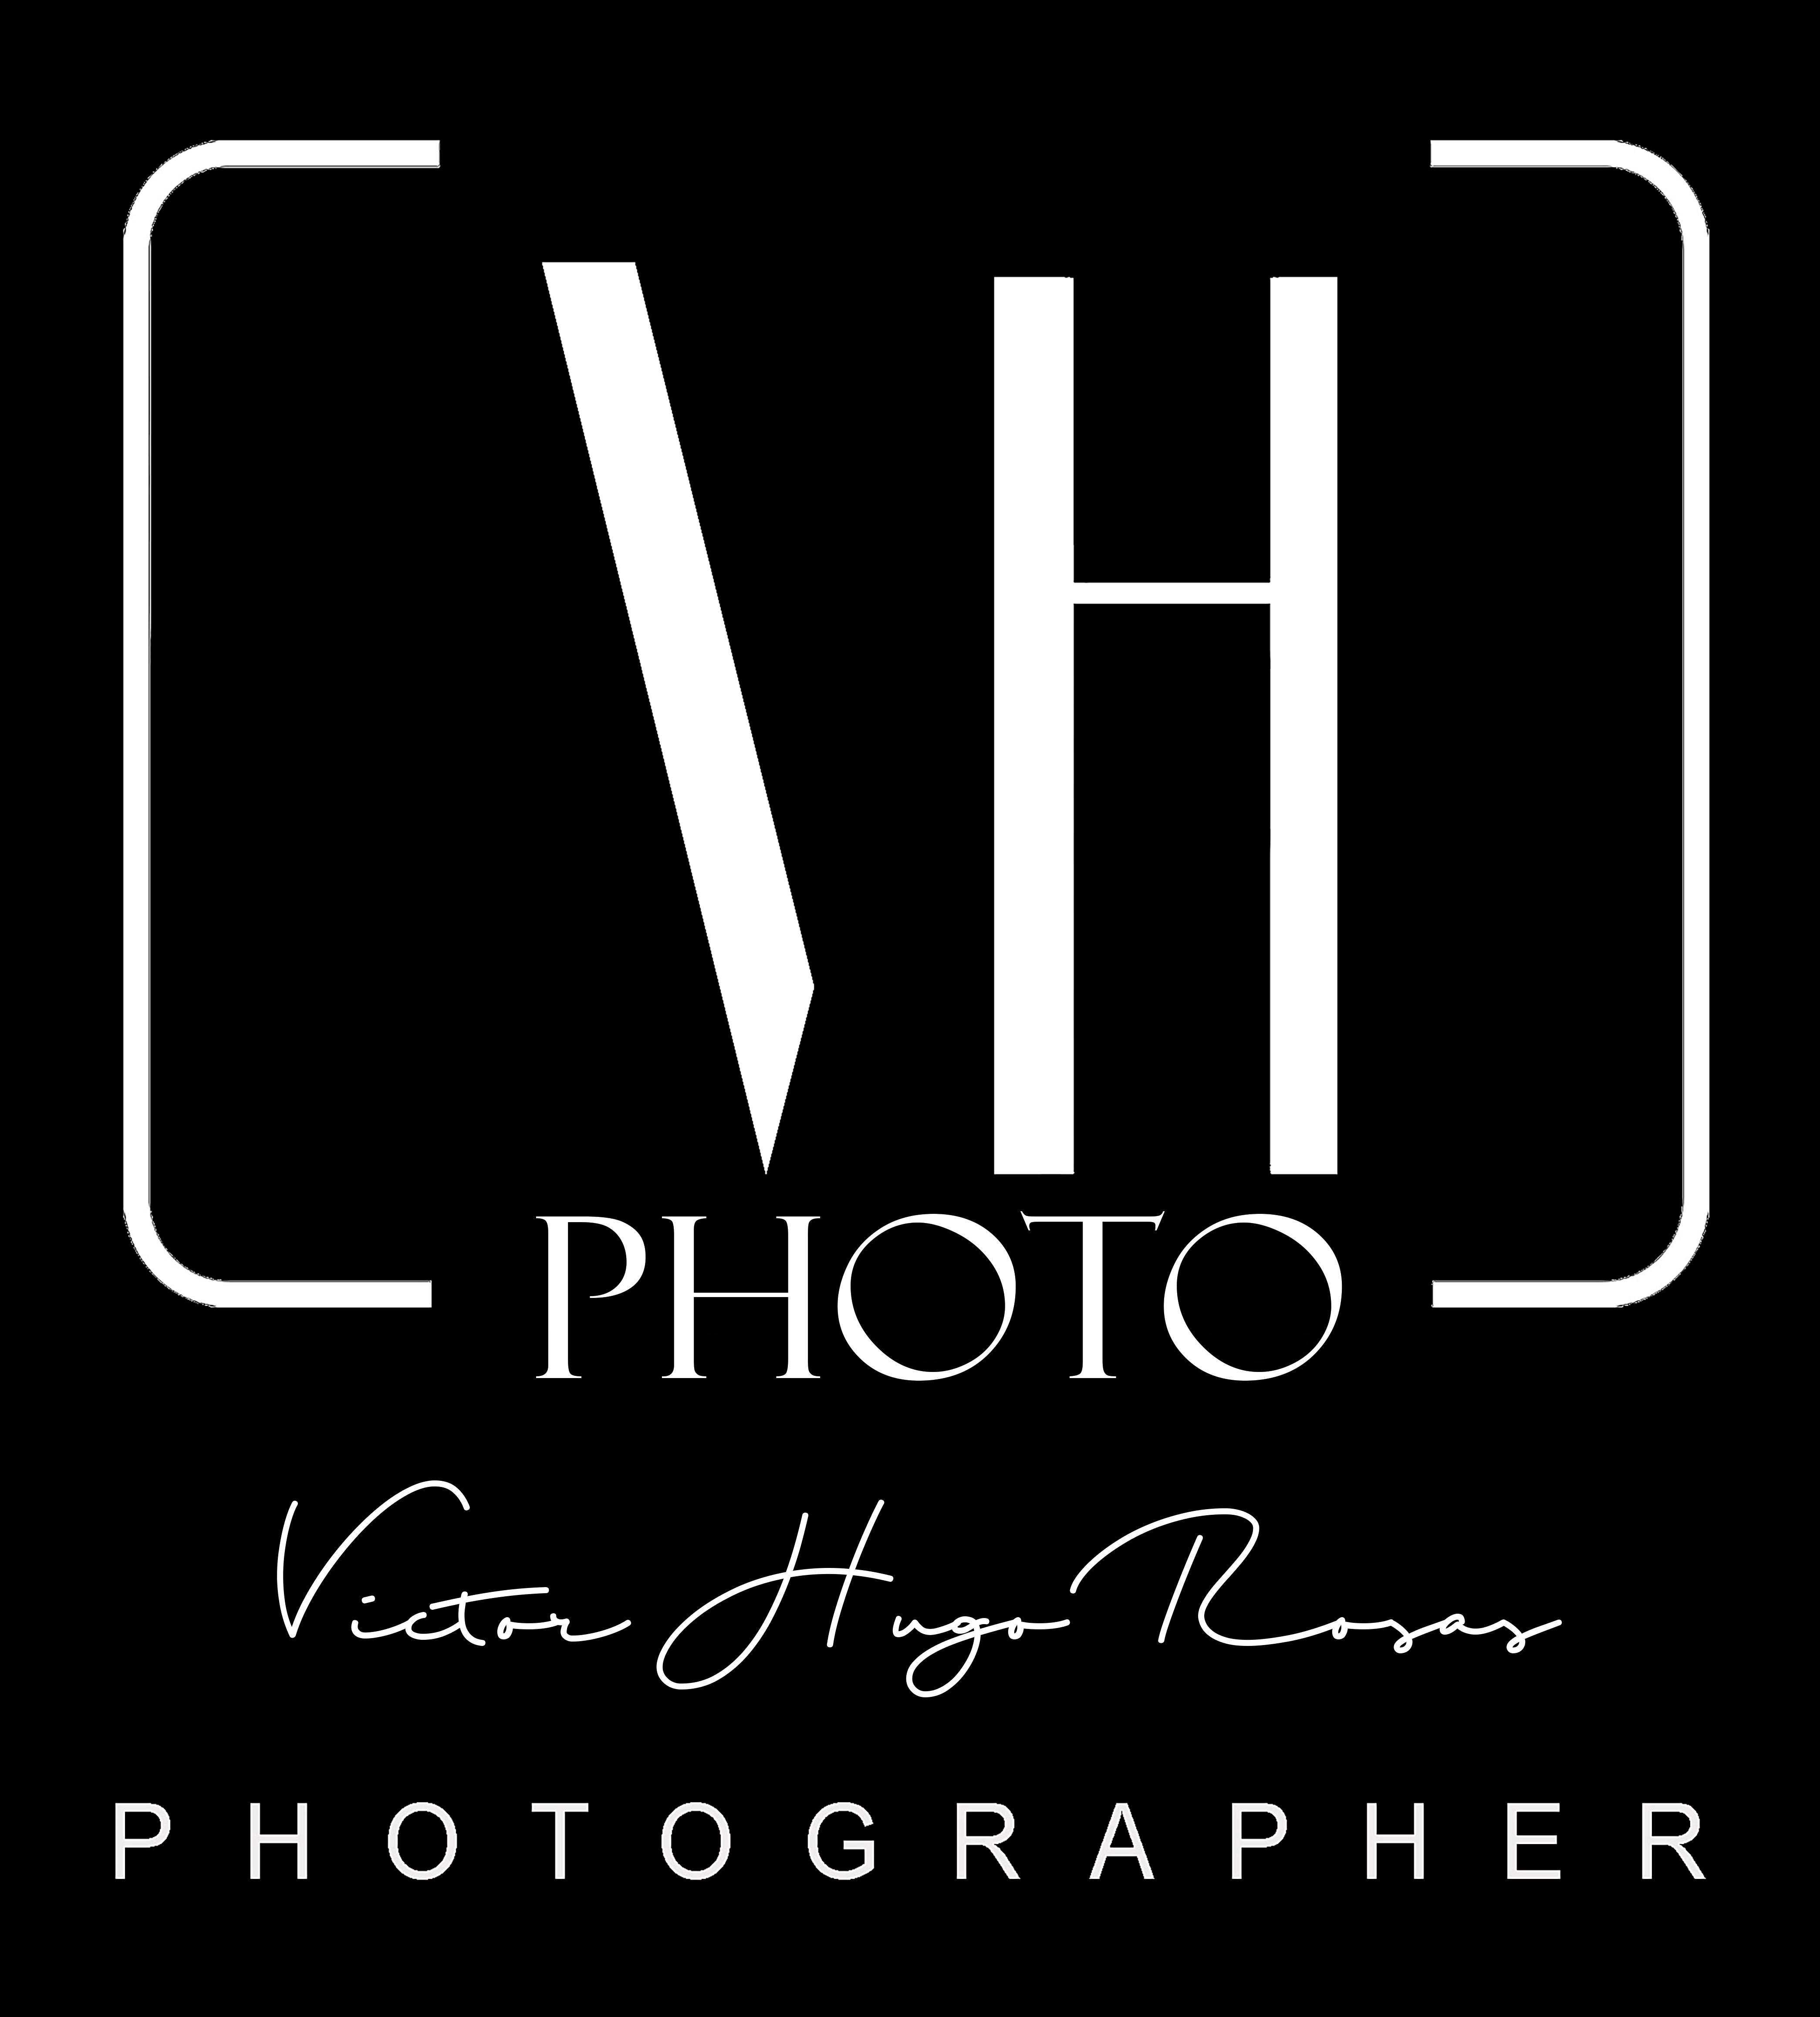 Tru Identity Designs's Competitor - VH Photo logo